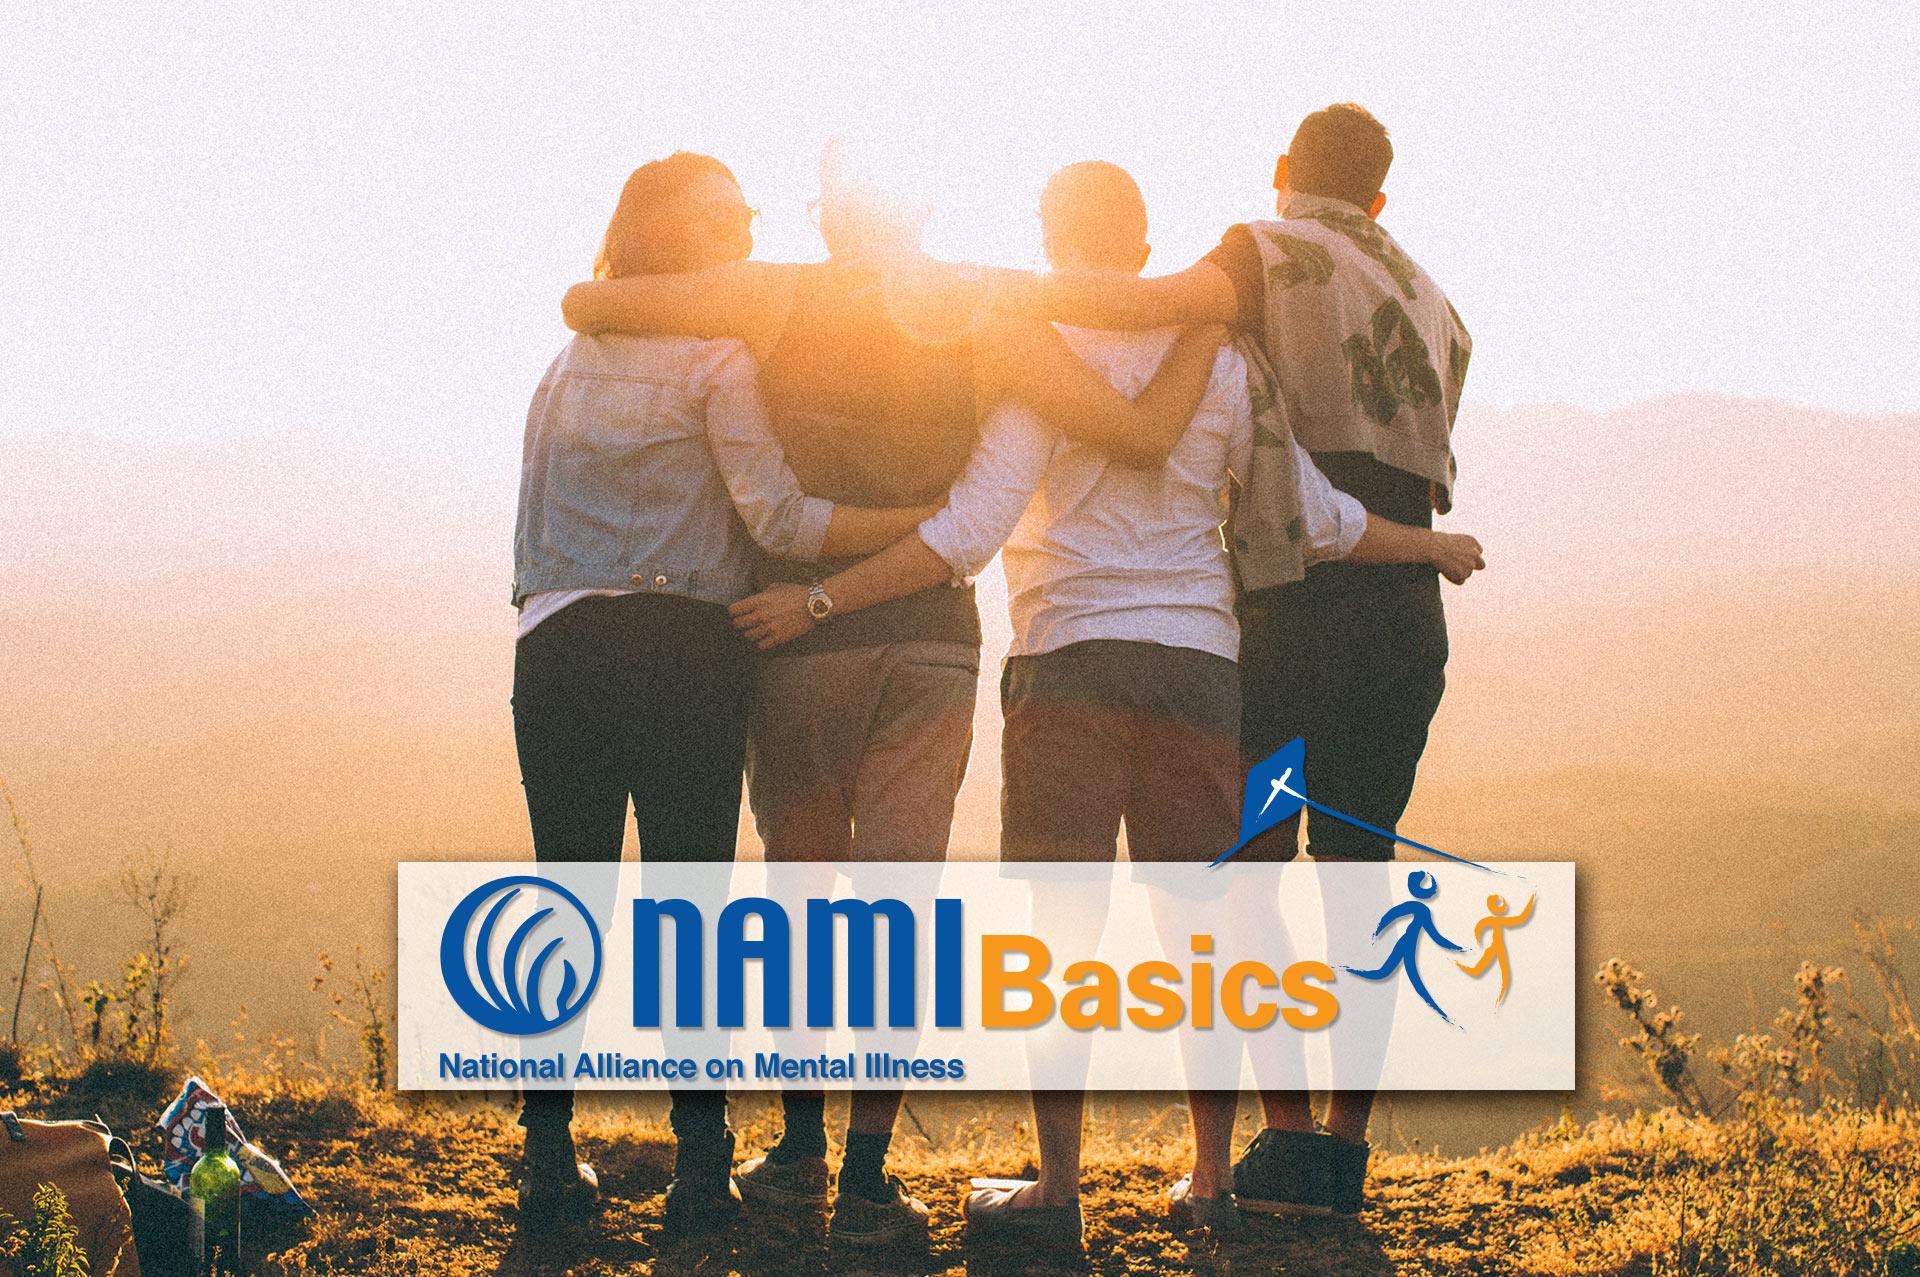 NAMI Basics Chicago